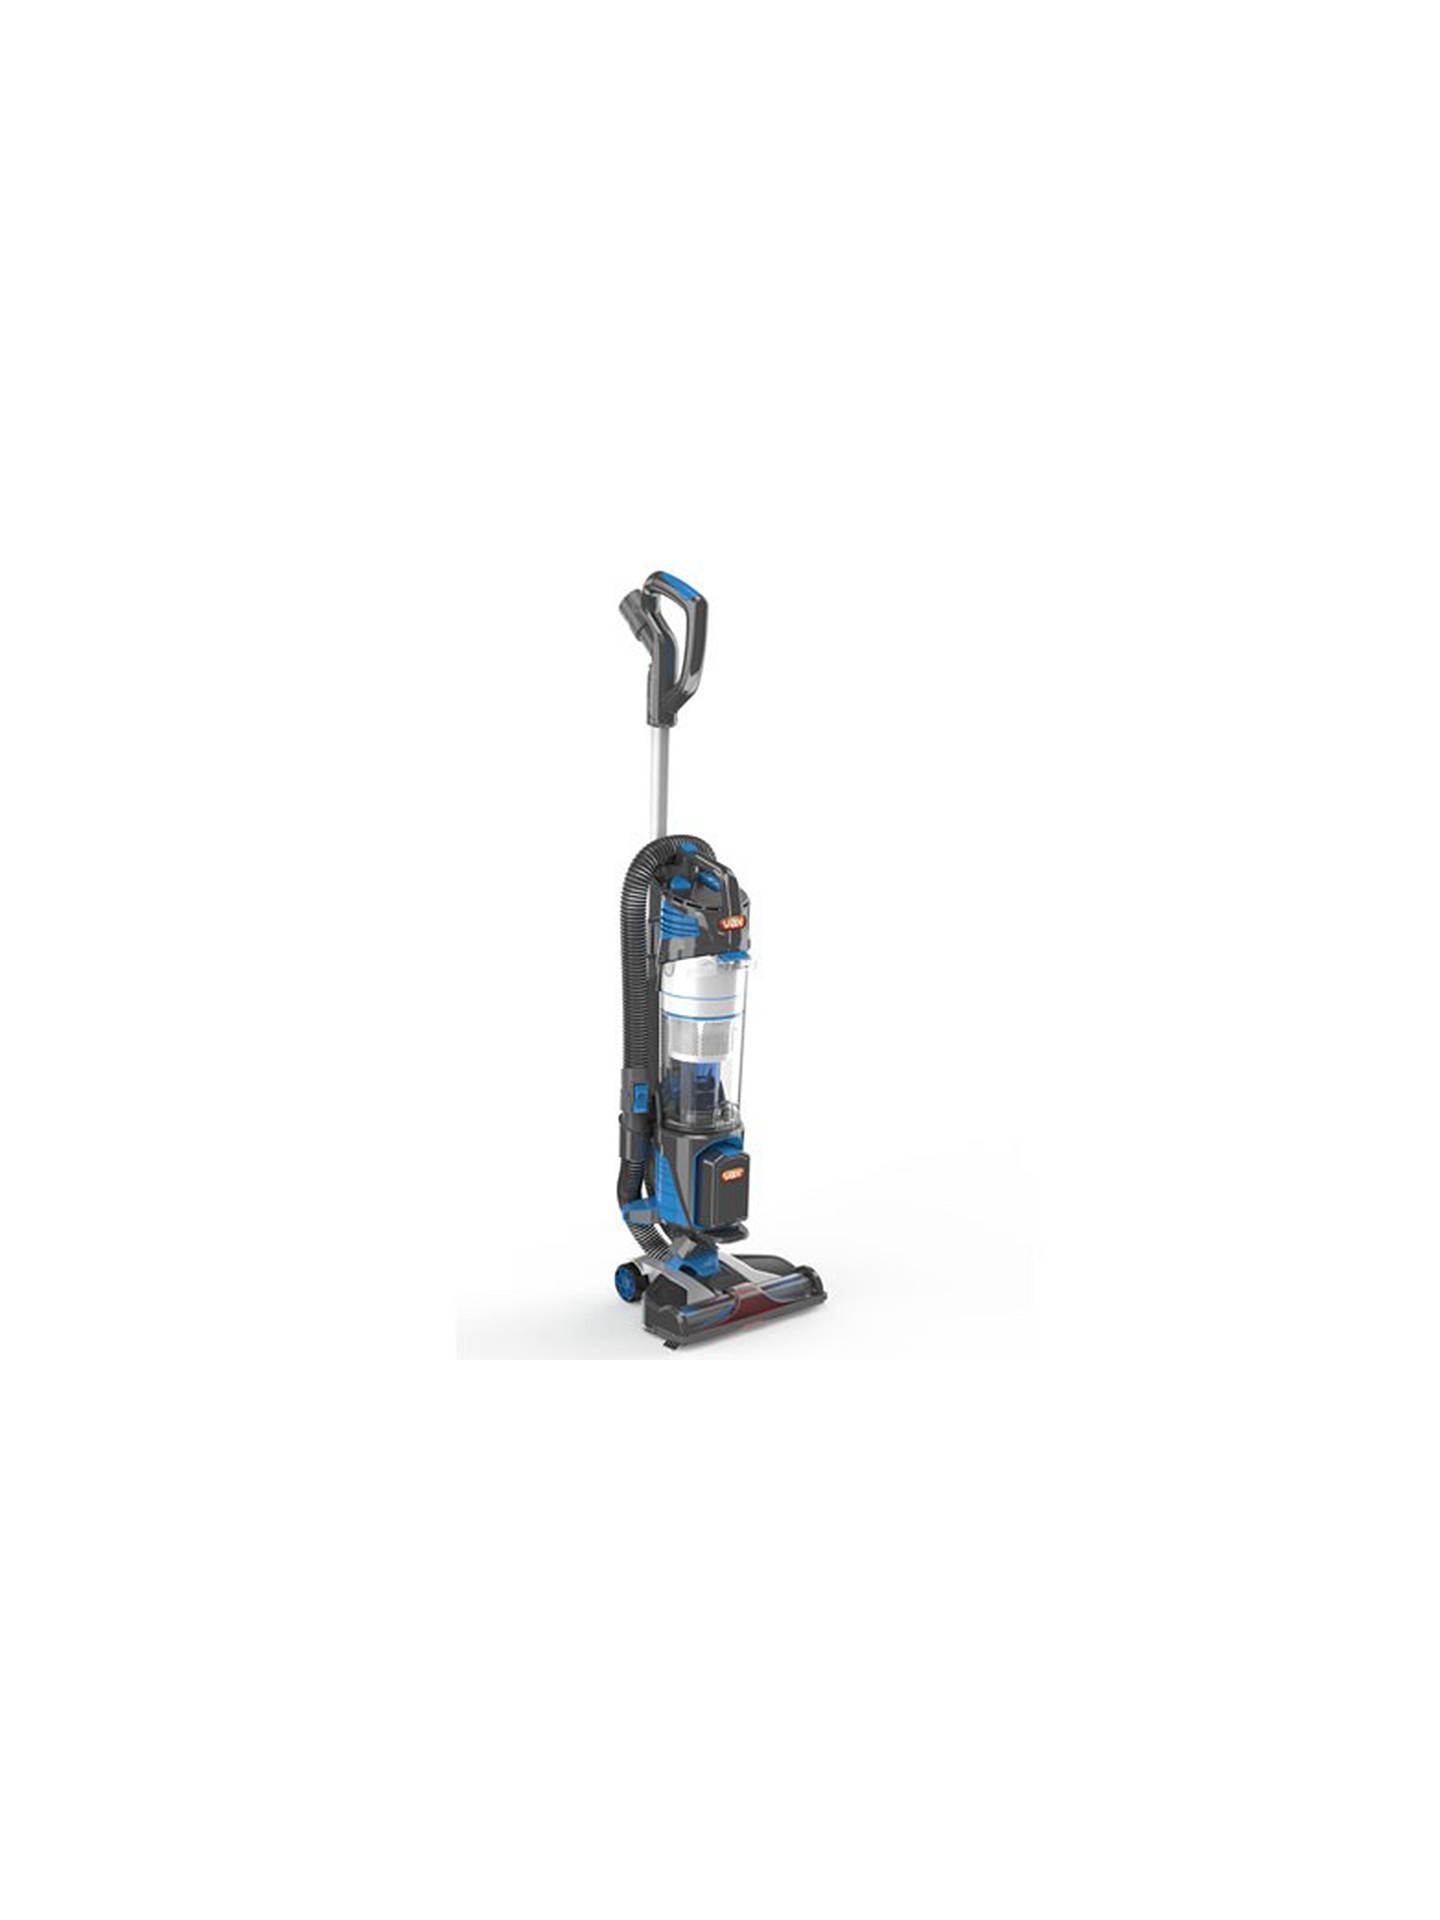 vax upright vacuum cleaner manual